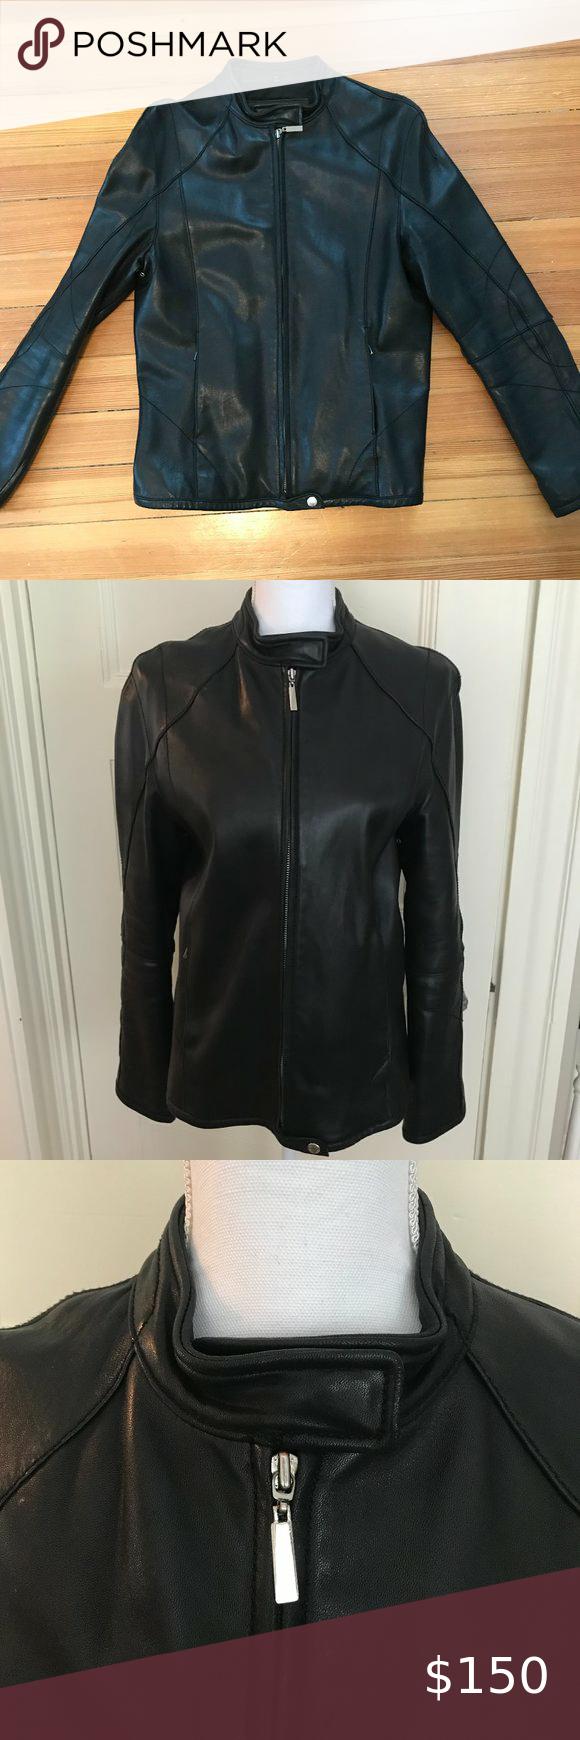 women/'s black leather jacket ... 019 Vintage LEATHER JACKET